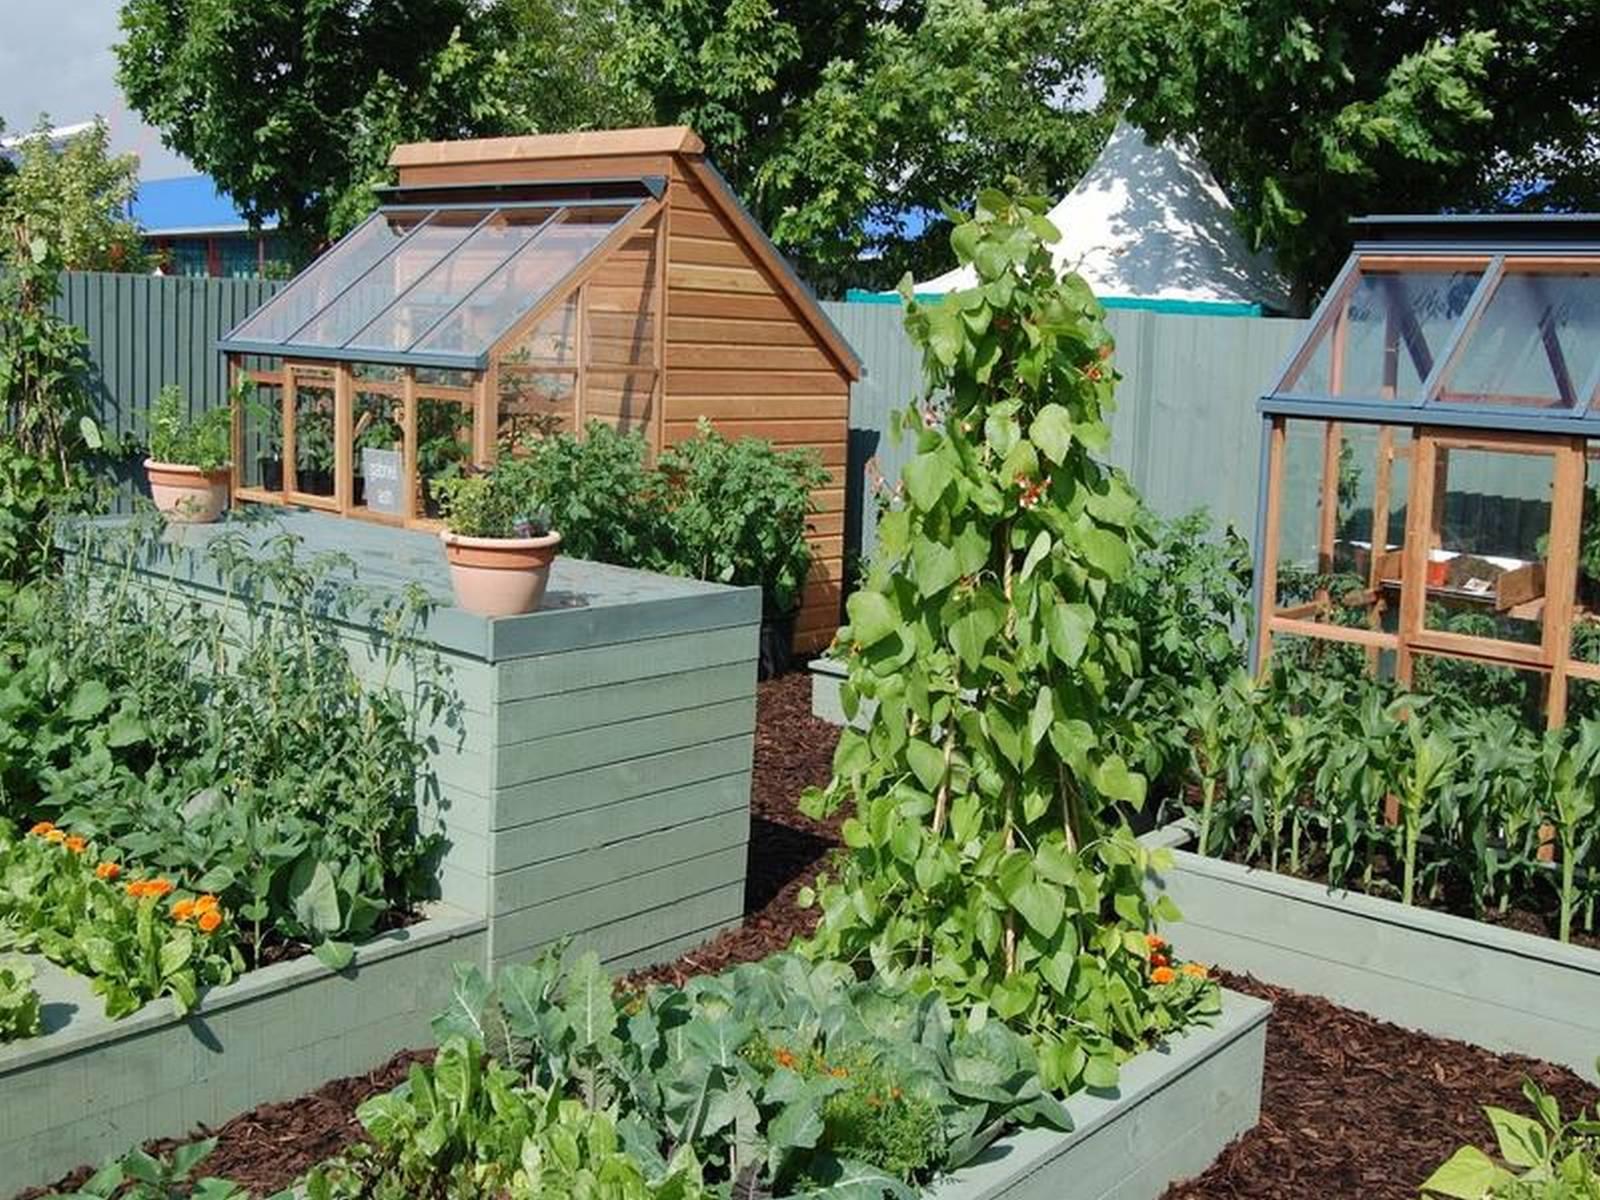 20 Impressive vegetable garden designs and plans  Interior Design Inspirations